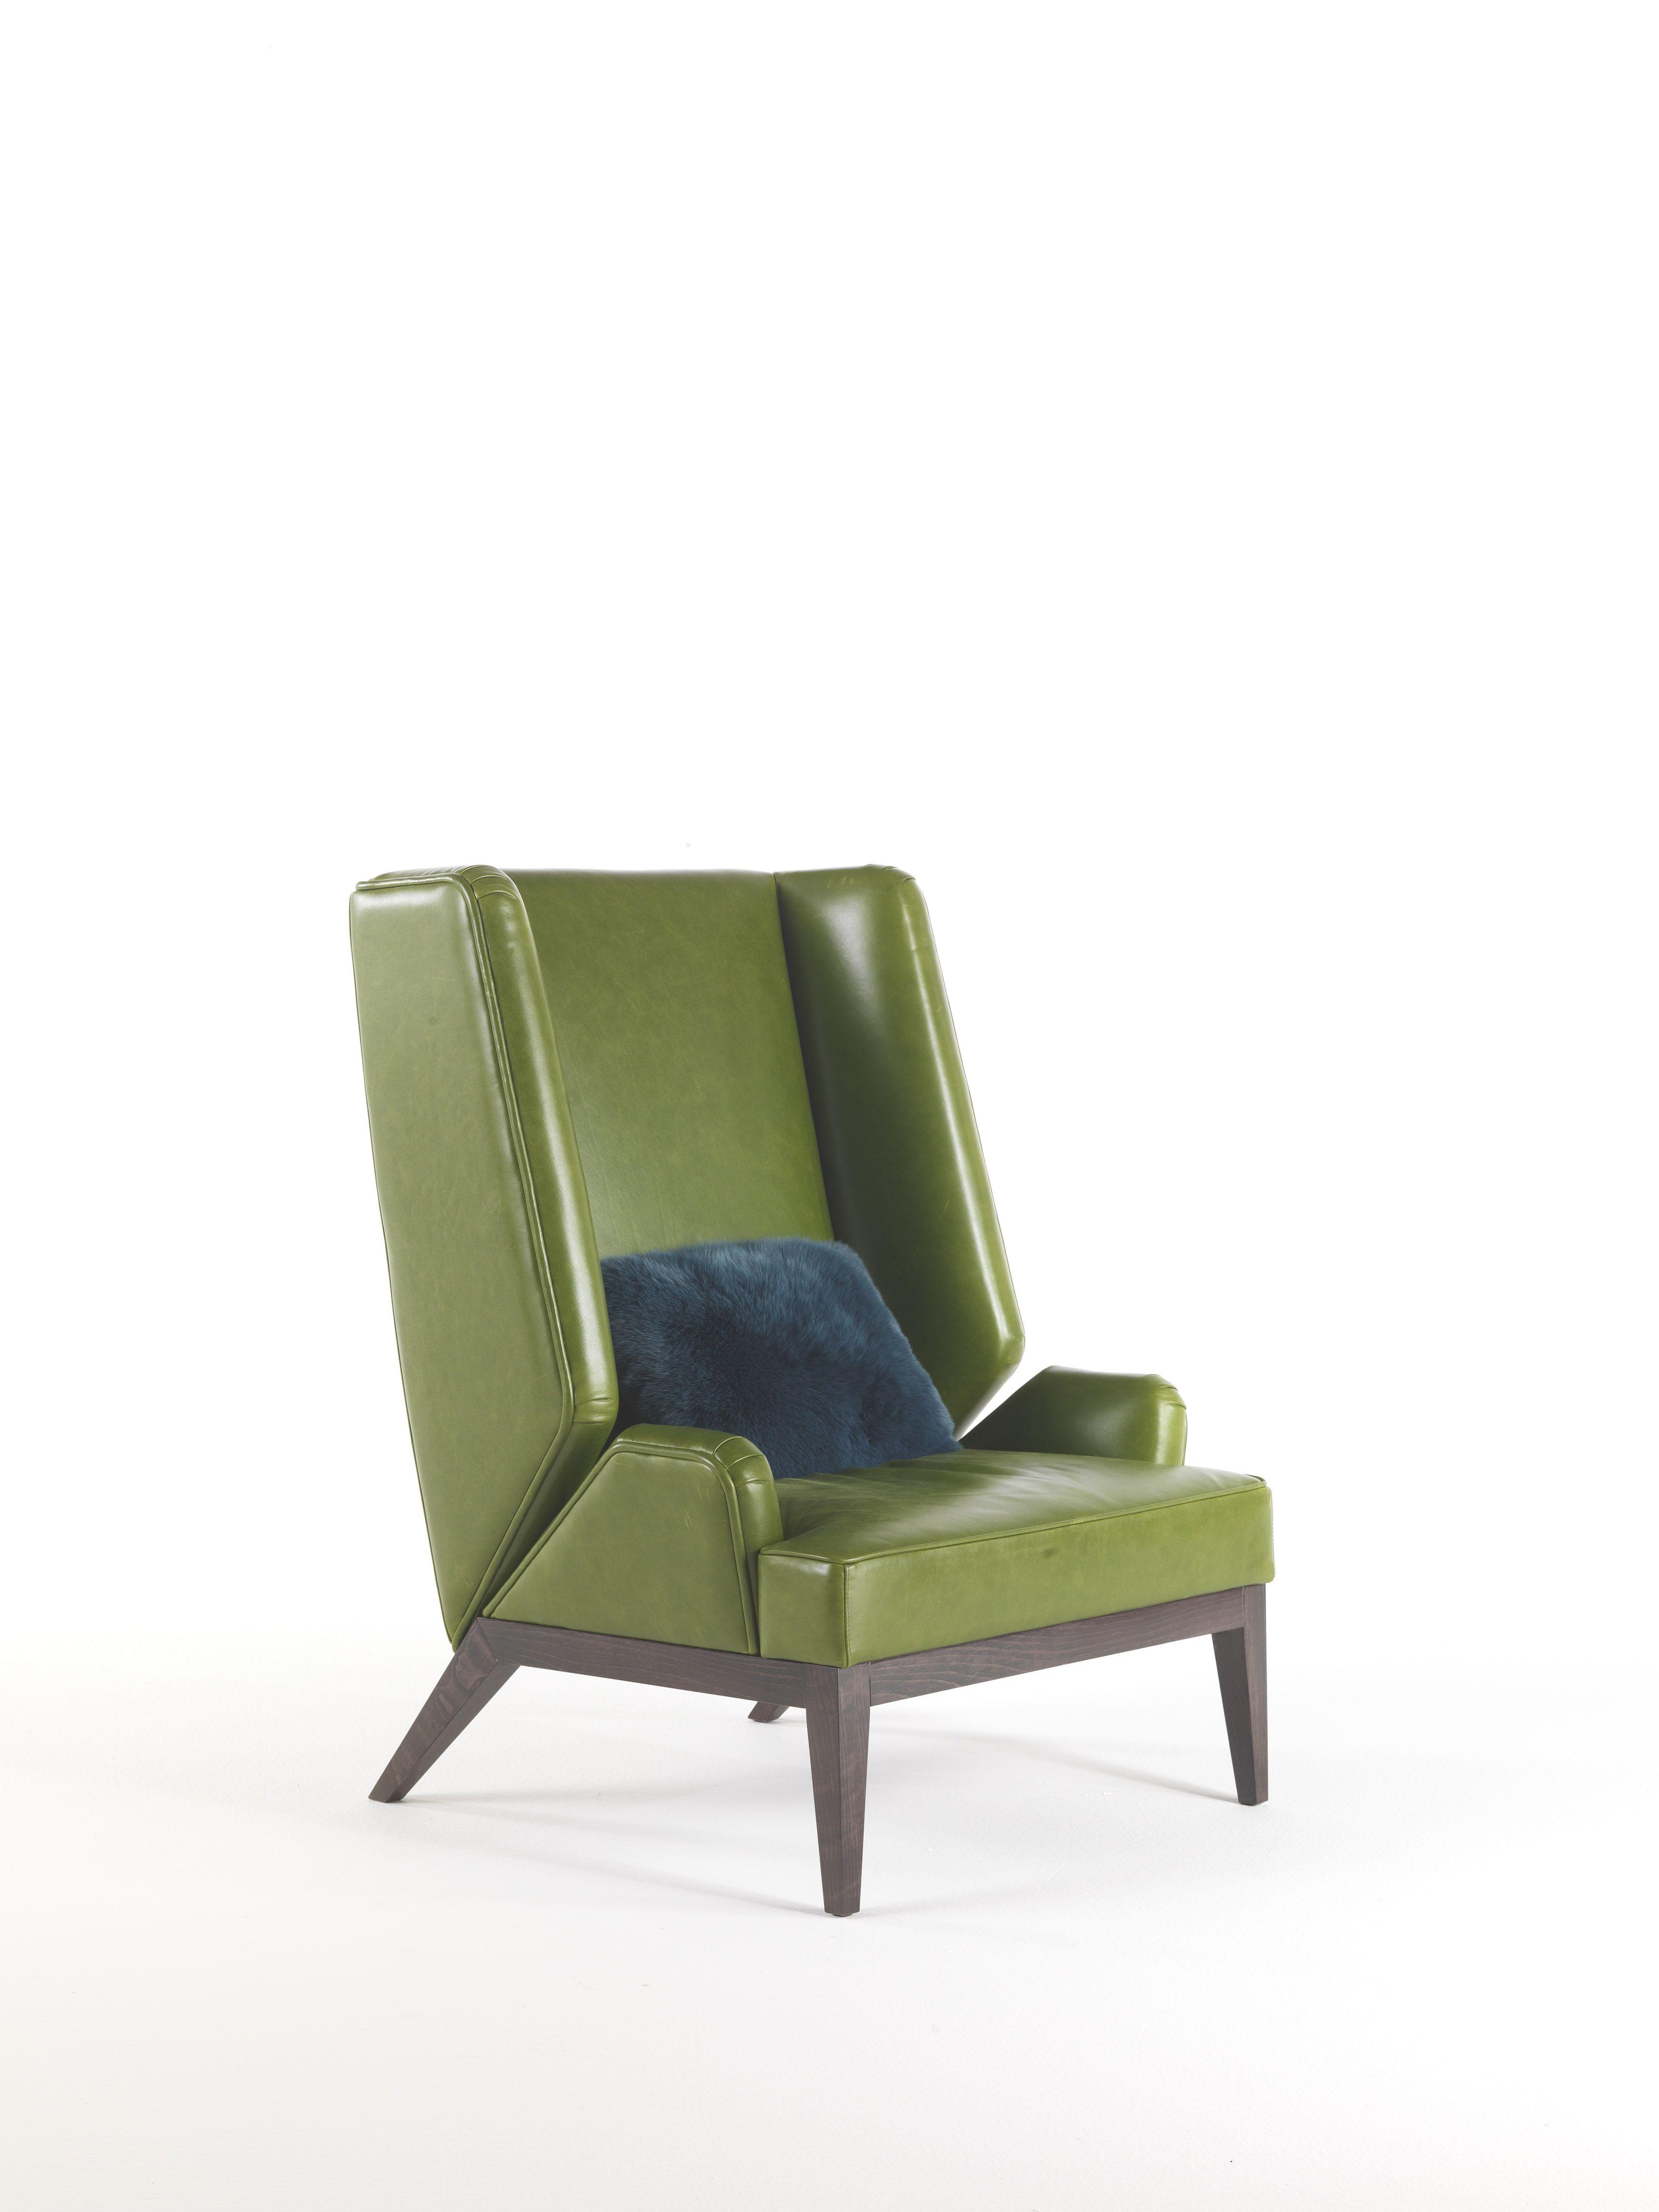 Roberto Cavalli Chair KingsofChelsea InteriorsStylist